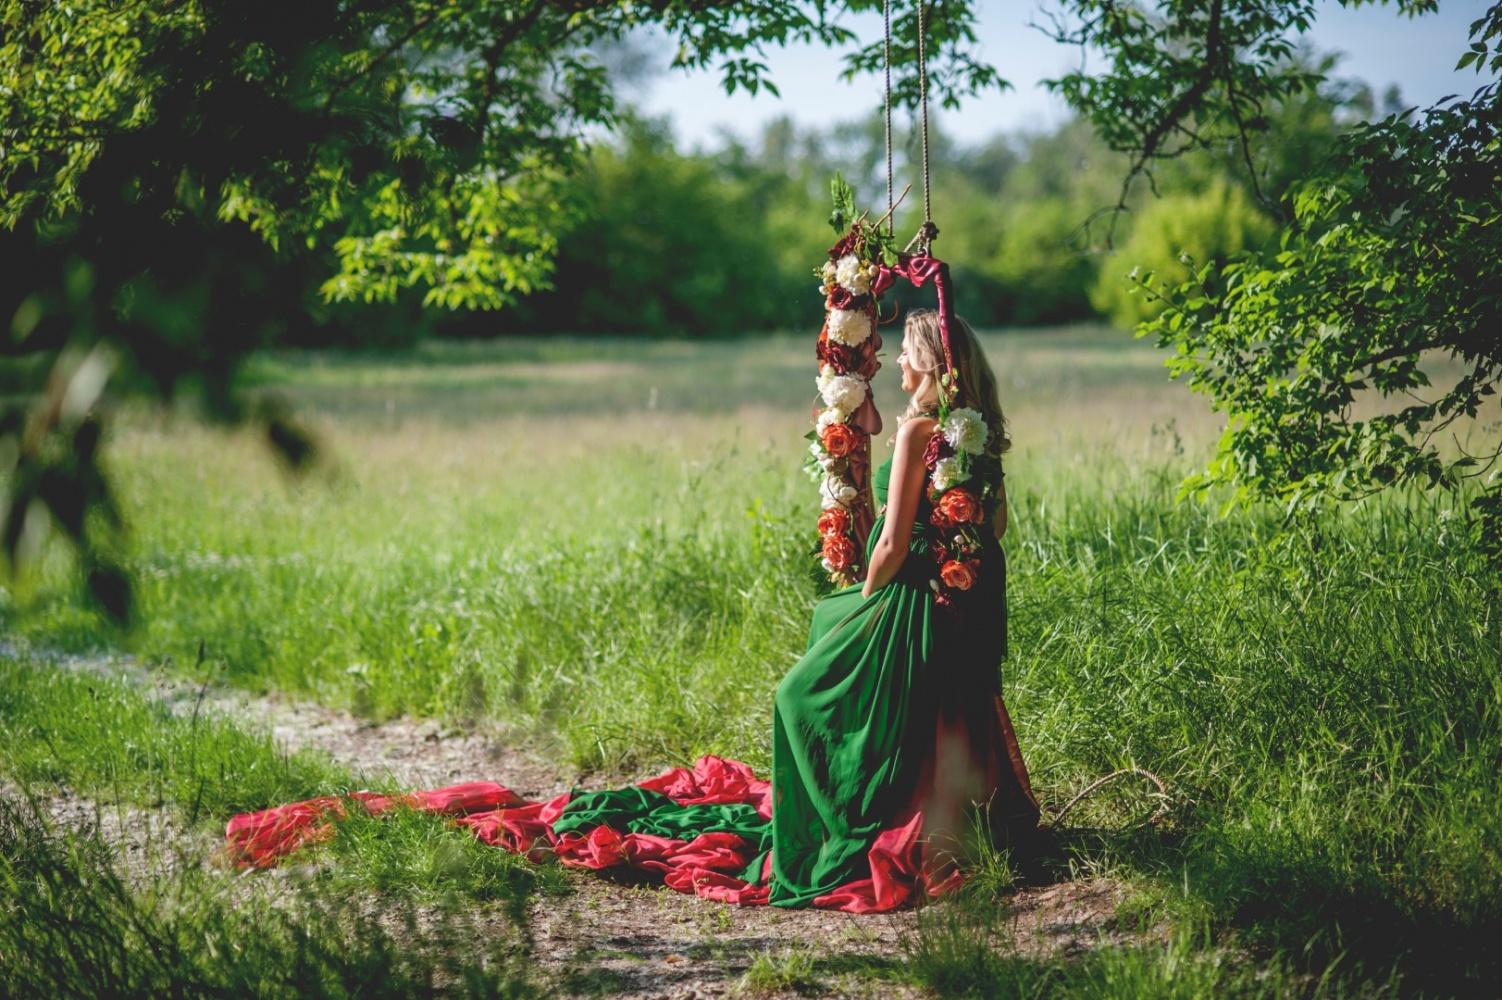 http://www.fotoz.sk/images/gallery-44/normal/kismama-fotozas_tehulka_fotenie-tehulky_juraj-zsok_kreativ-kismama-fotozas_pregnacy-photo_pregnacy-photography037.jpg